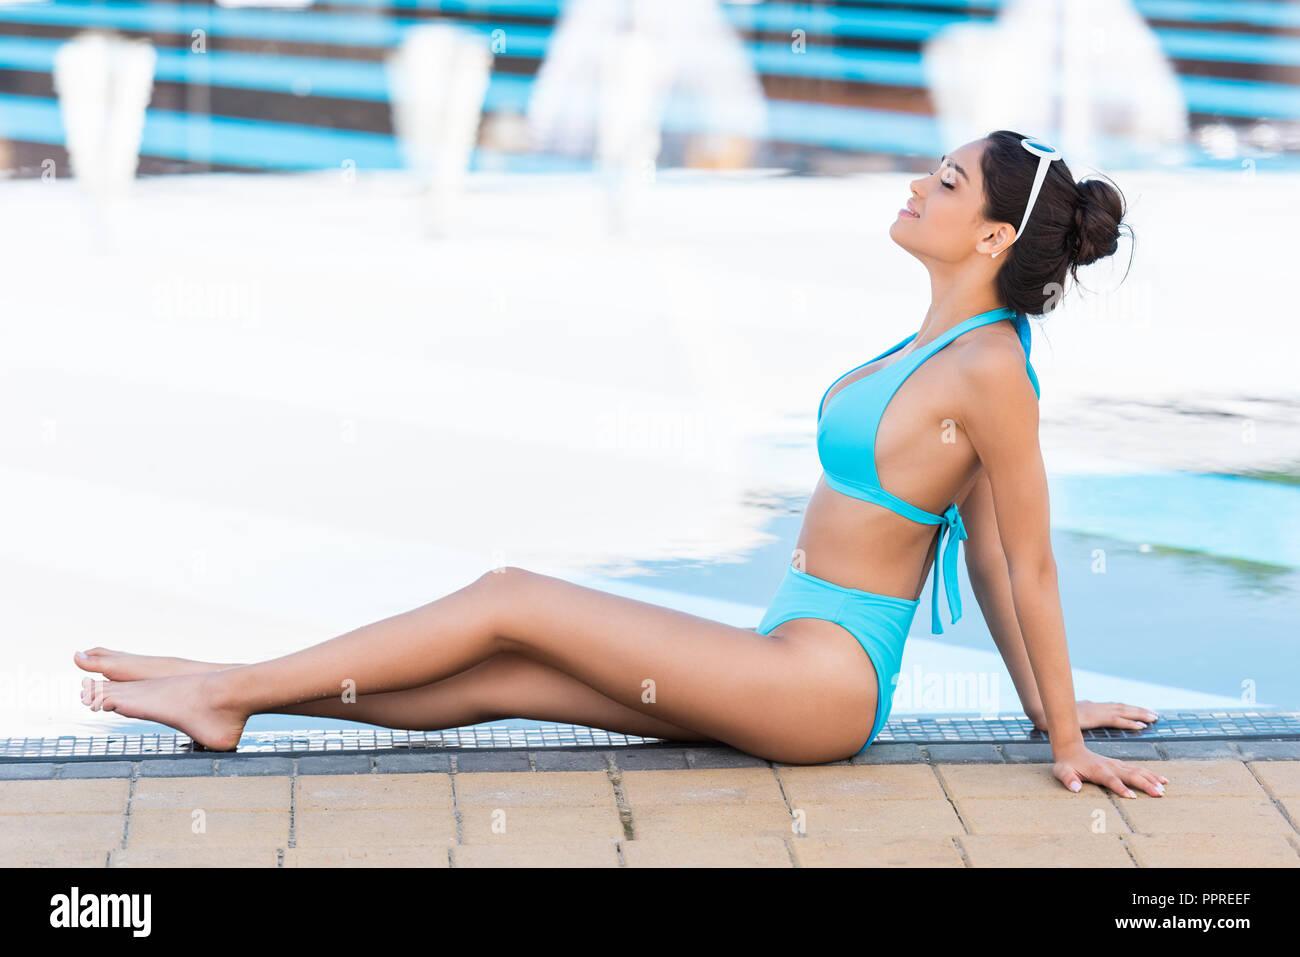 Fotos Imágenes De In Bikini Sunbathing Stockamp; n0wPk8OX